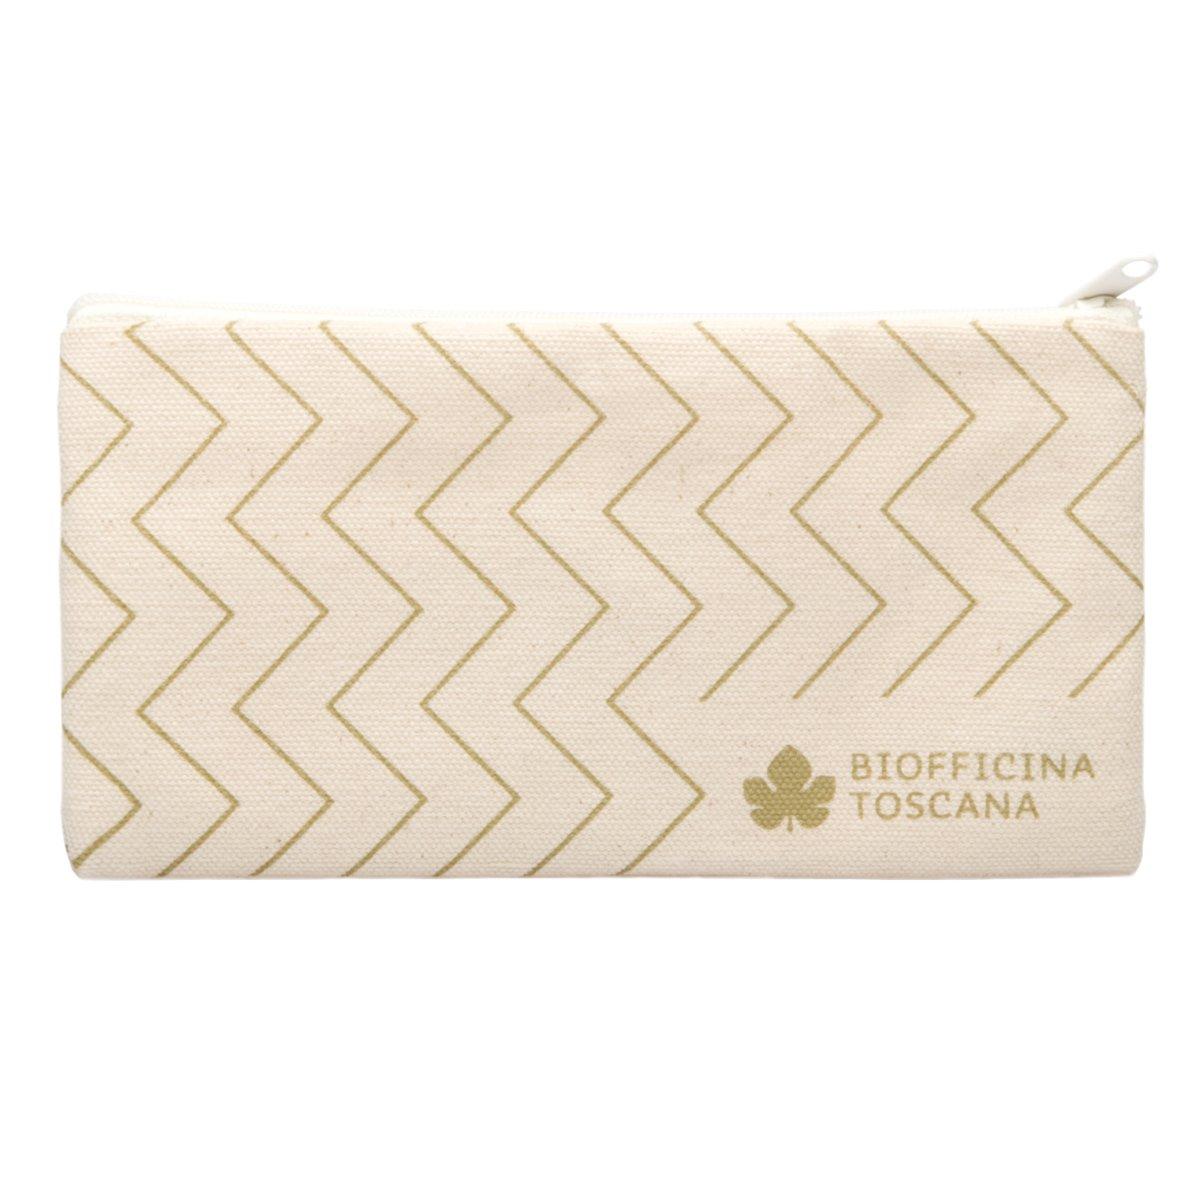 Trousse zig zag in cotone Biofficina Toscana